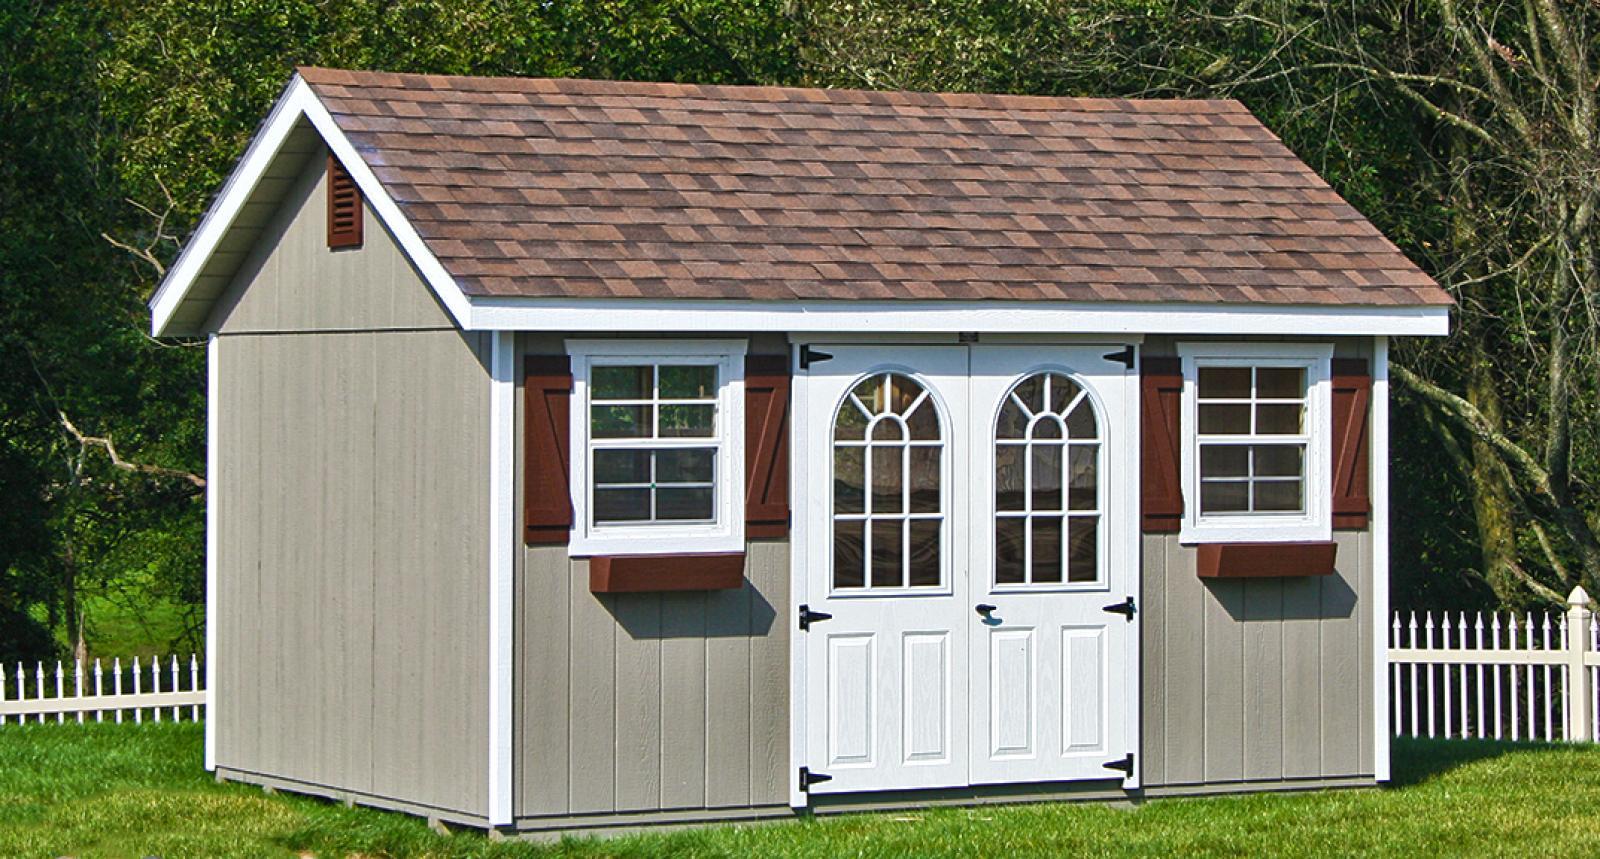 storage-shed-garden-shed-a-frame-2